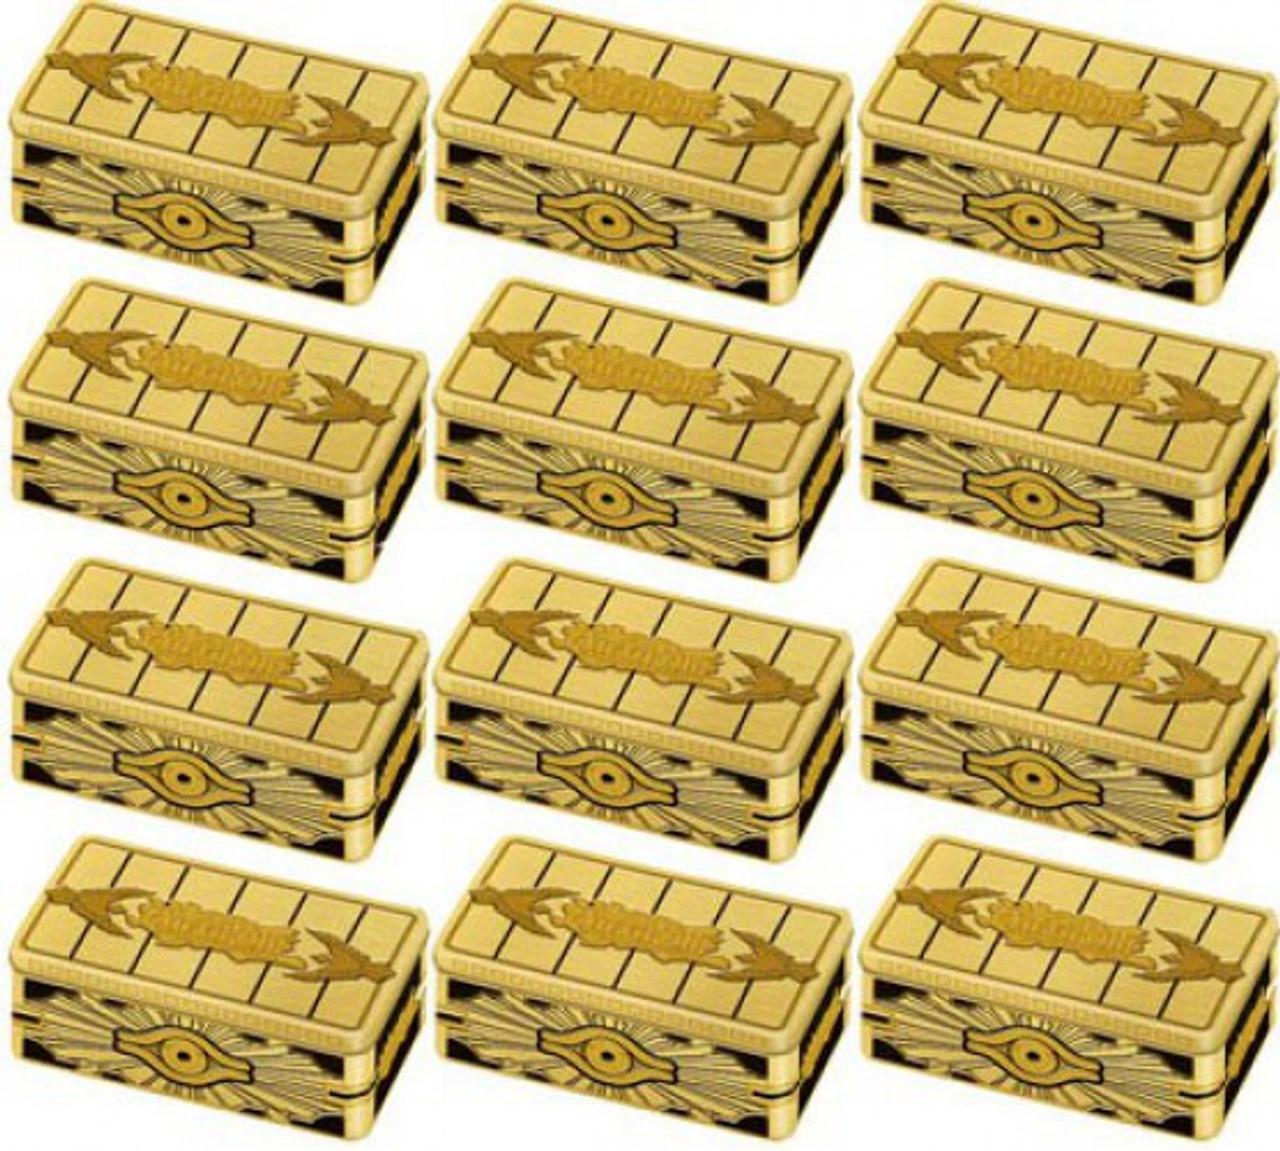 Yugioh Gold Sarcophagus Tin Sealed Konami - Berkshireregion